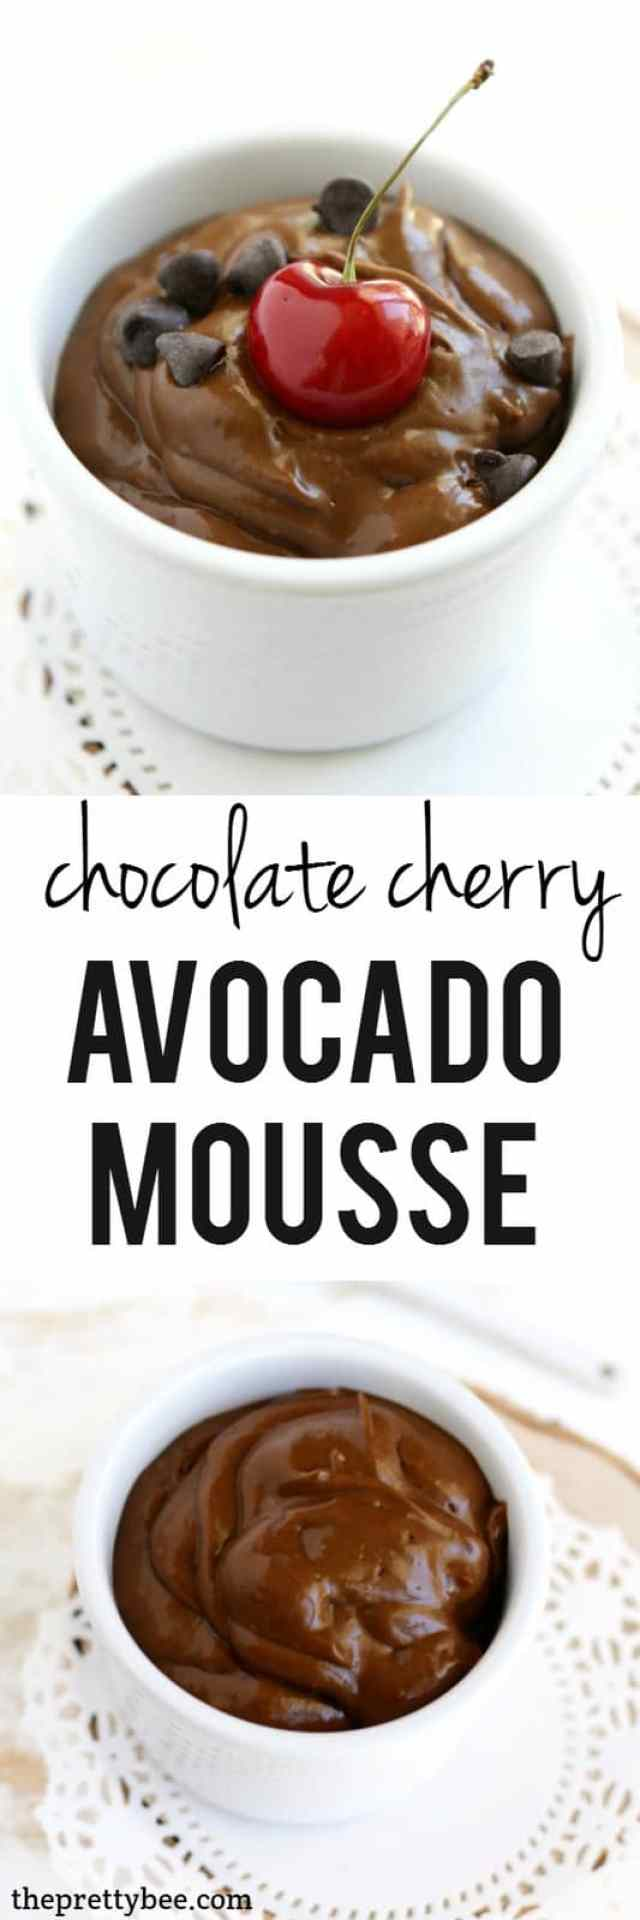 Cherry Chocolate Avocado Mousse. - The Pretty Bee